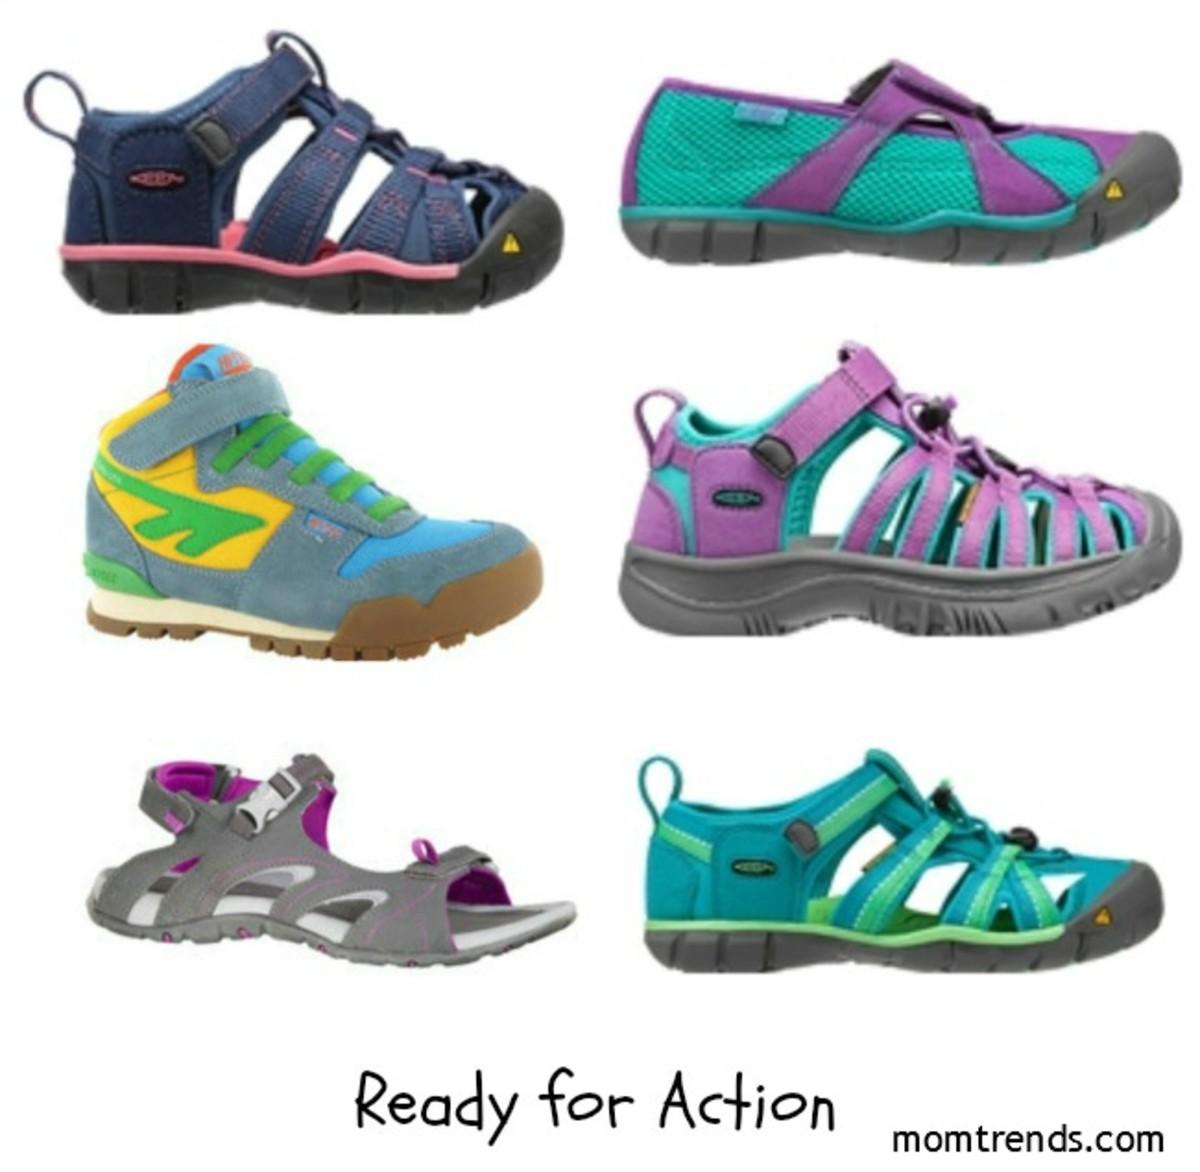 keen, stride rite, hi-tec, children's place, summer shoes, kids summer shoes, water shoes